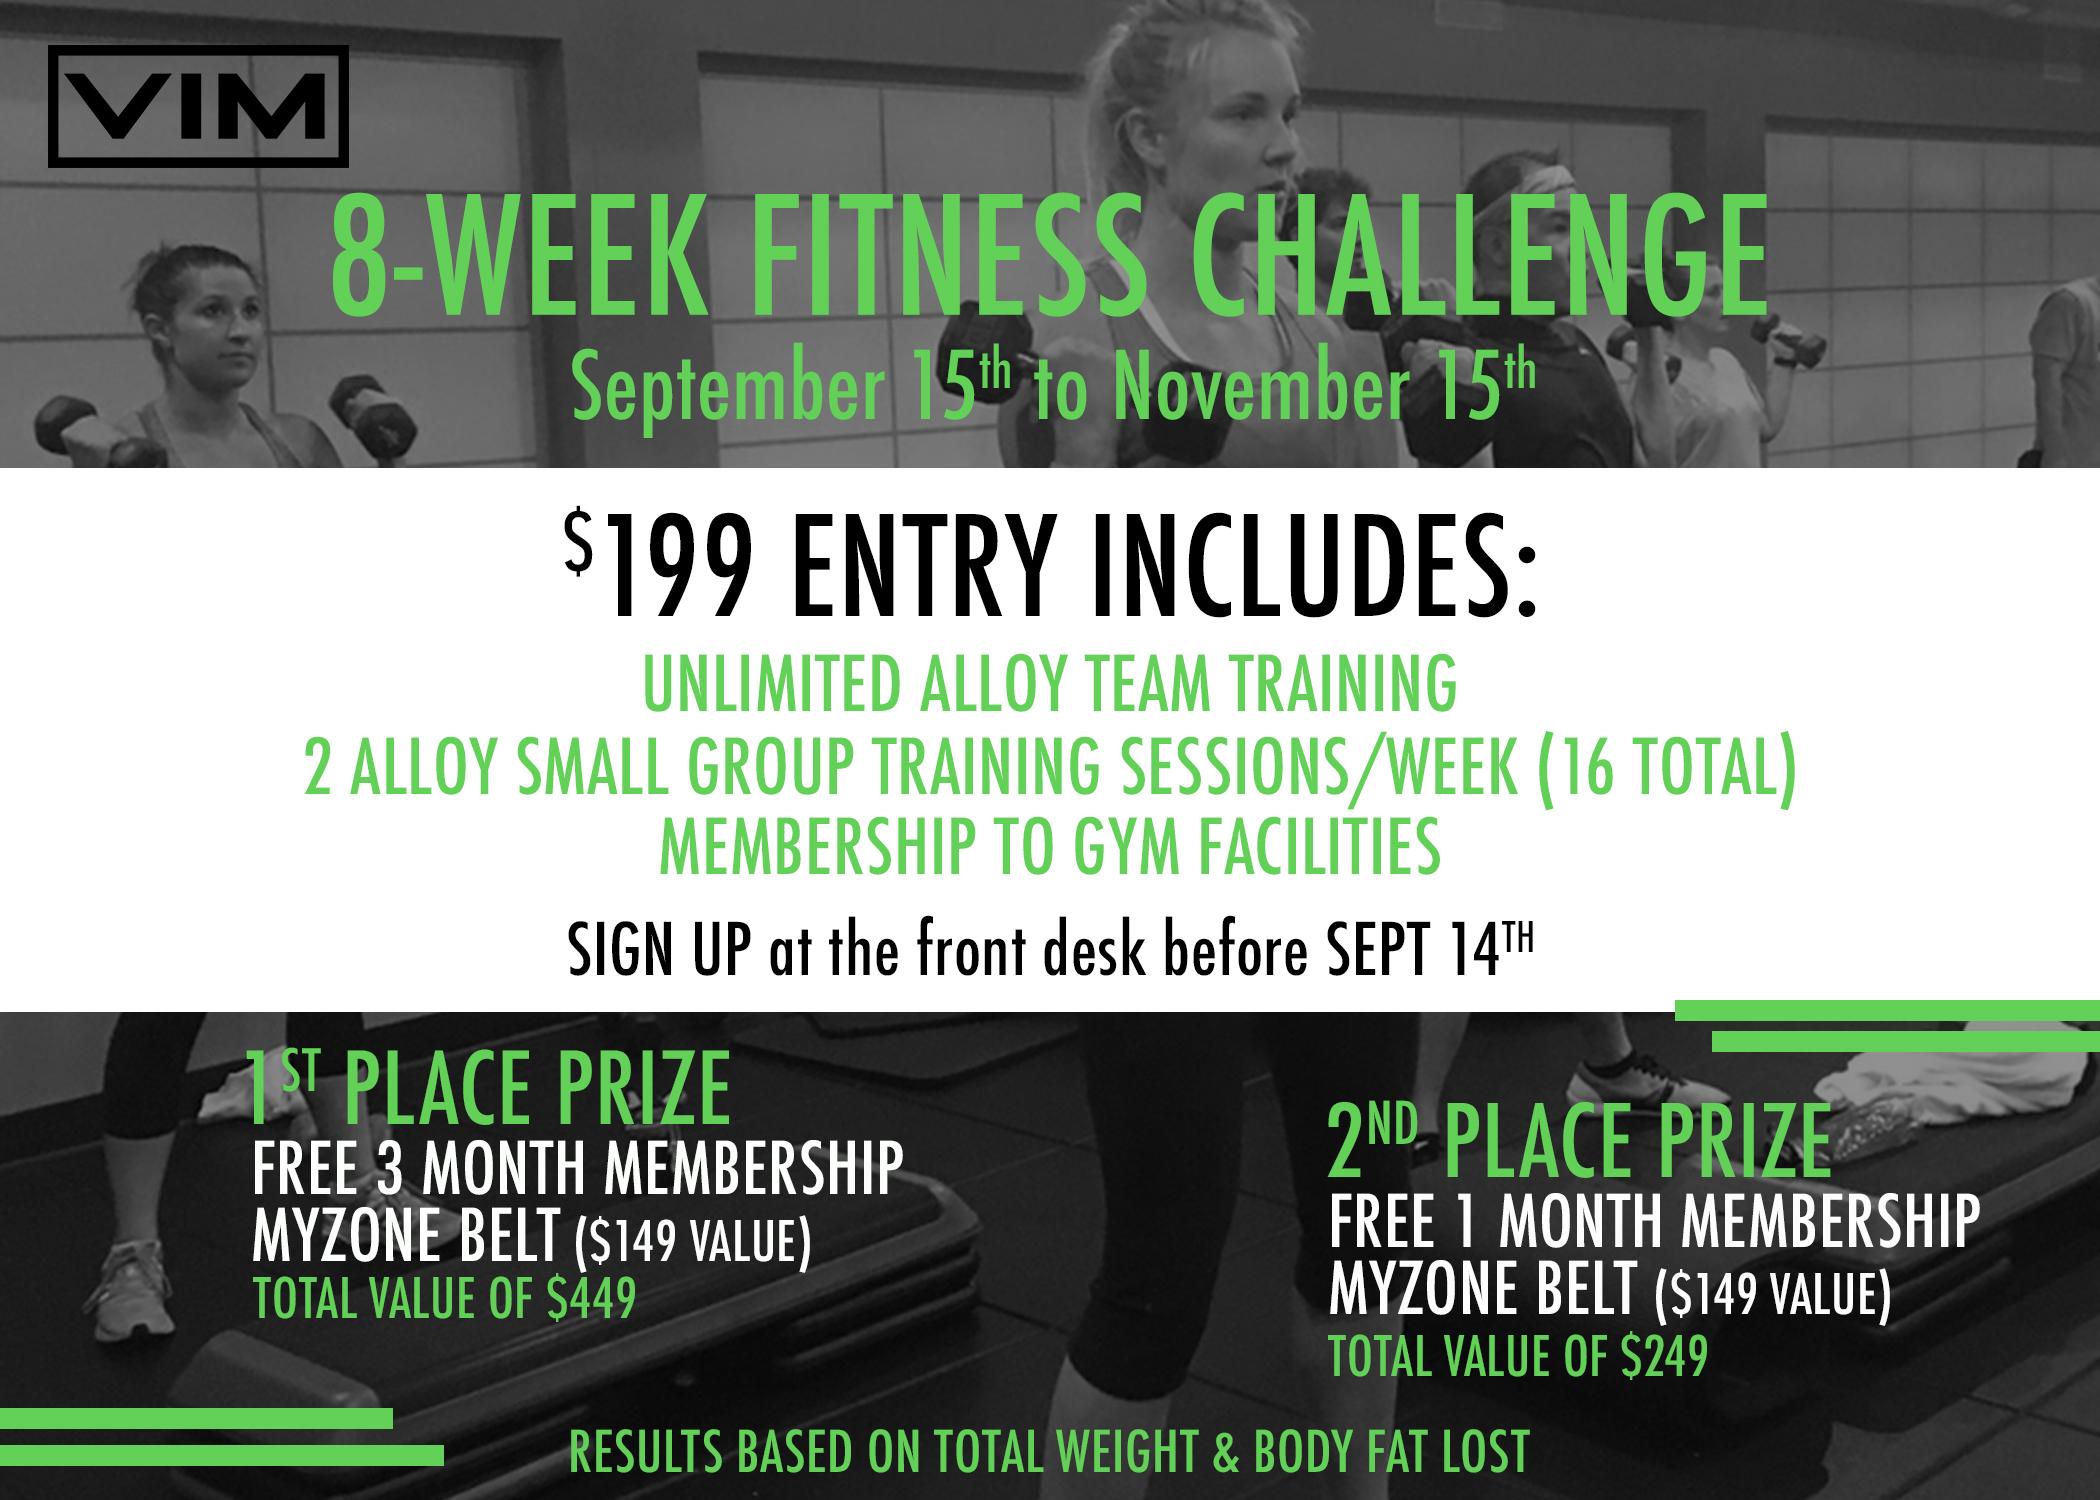 8 WEEK FITNESS CHALLENGE! - VIM | Fitness